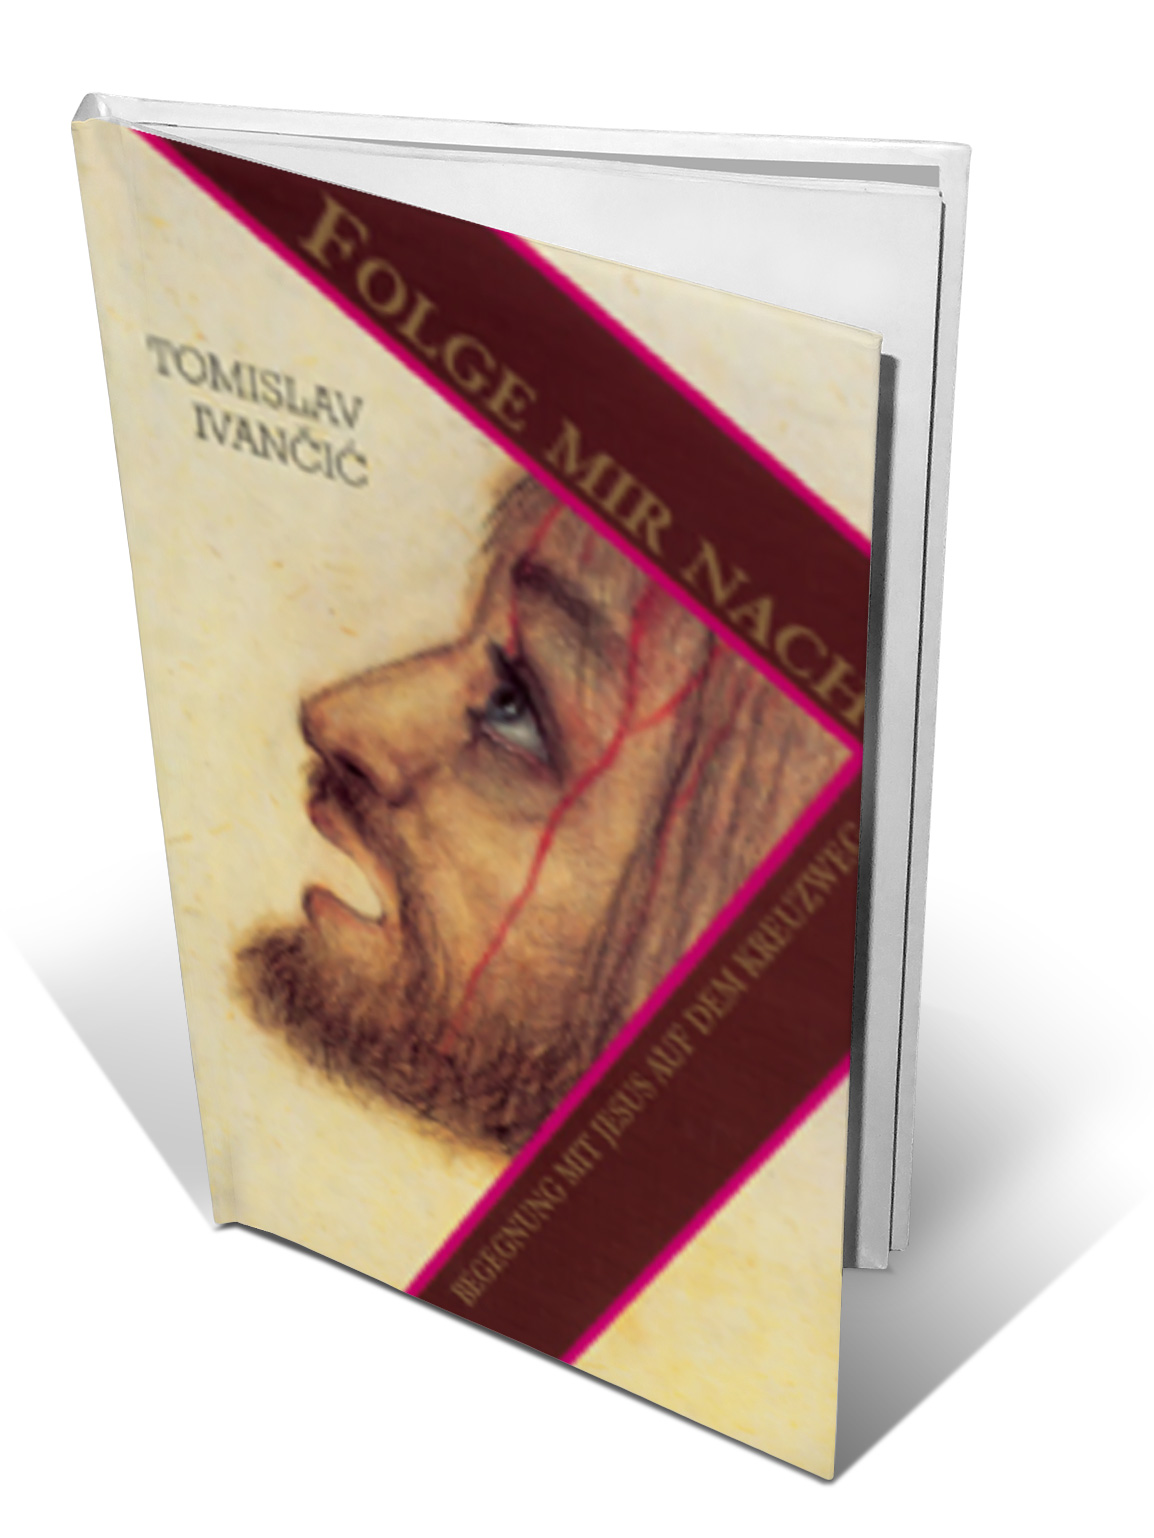 FOLGE MIR NACH - BEGEGNUNG MIT JESUS AUF DEM KREUZWEG - Tomislav Ivančić